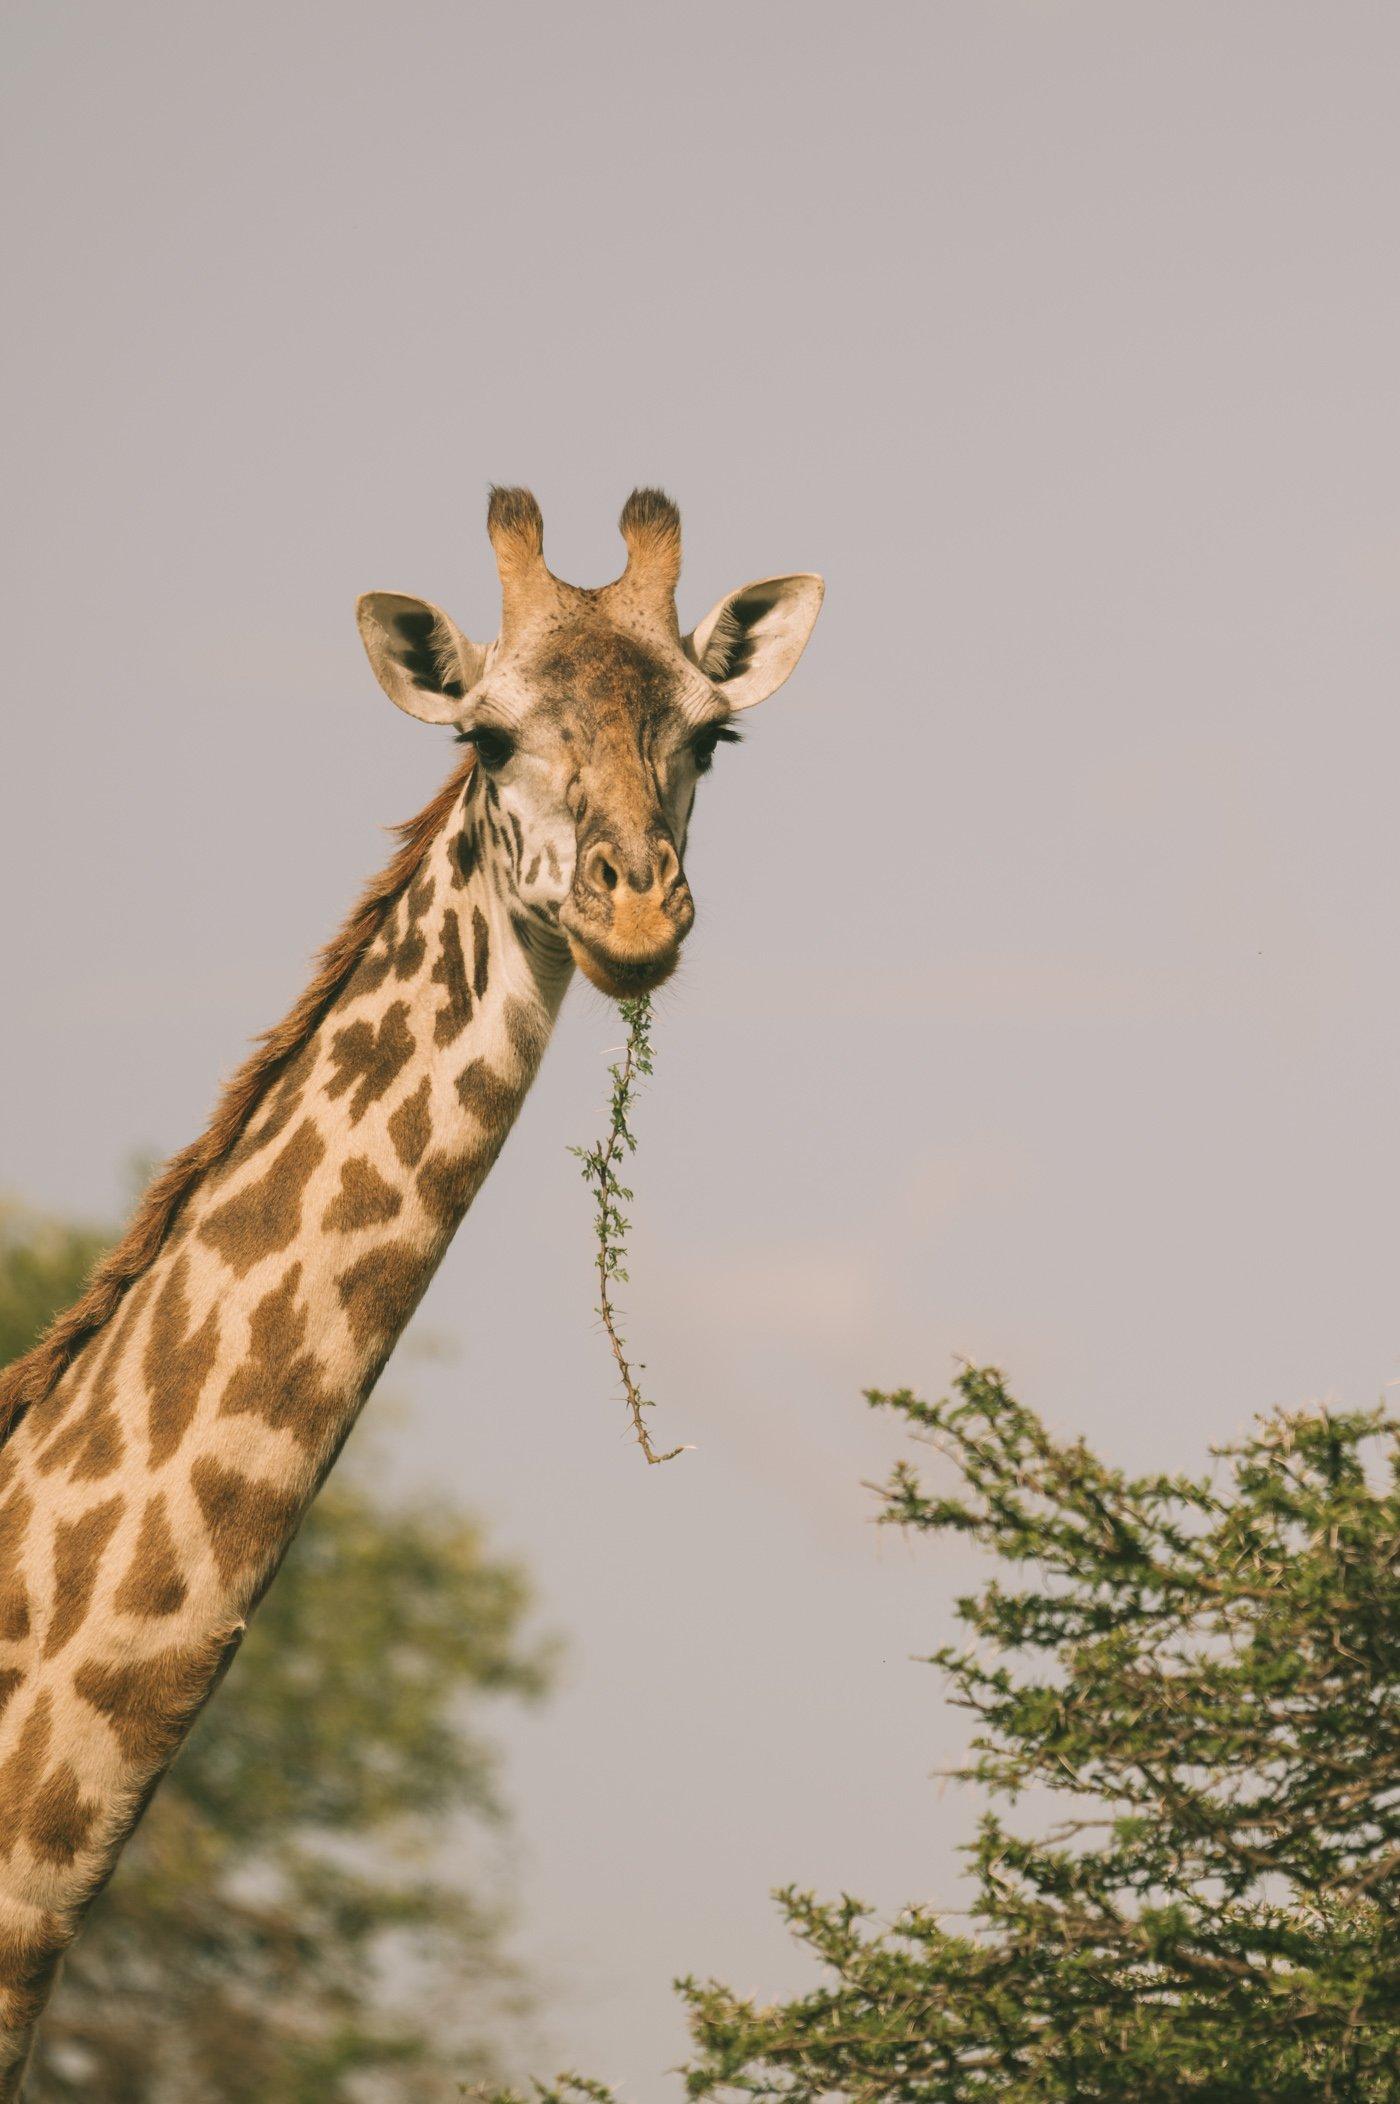 Giraffe at Cottar's in Kenya